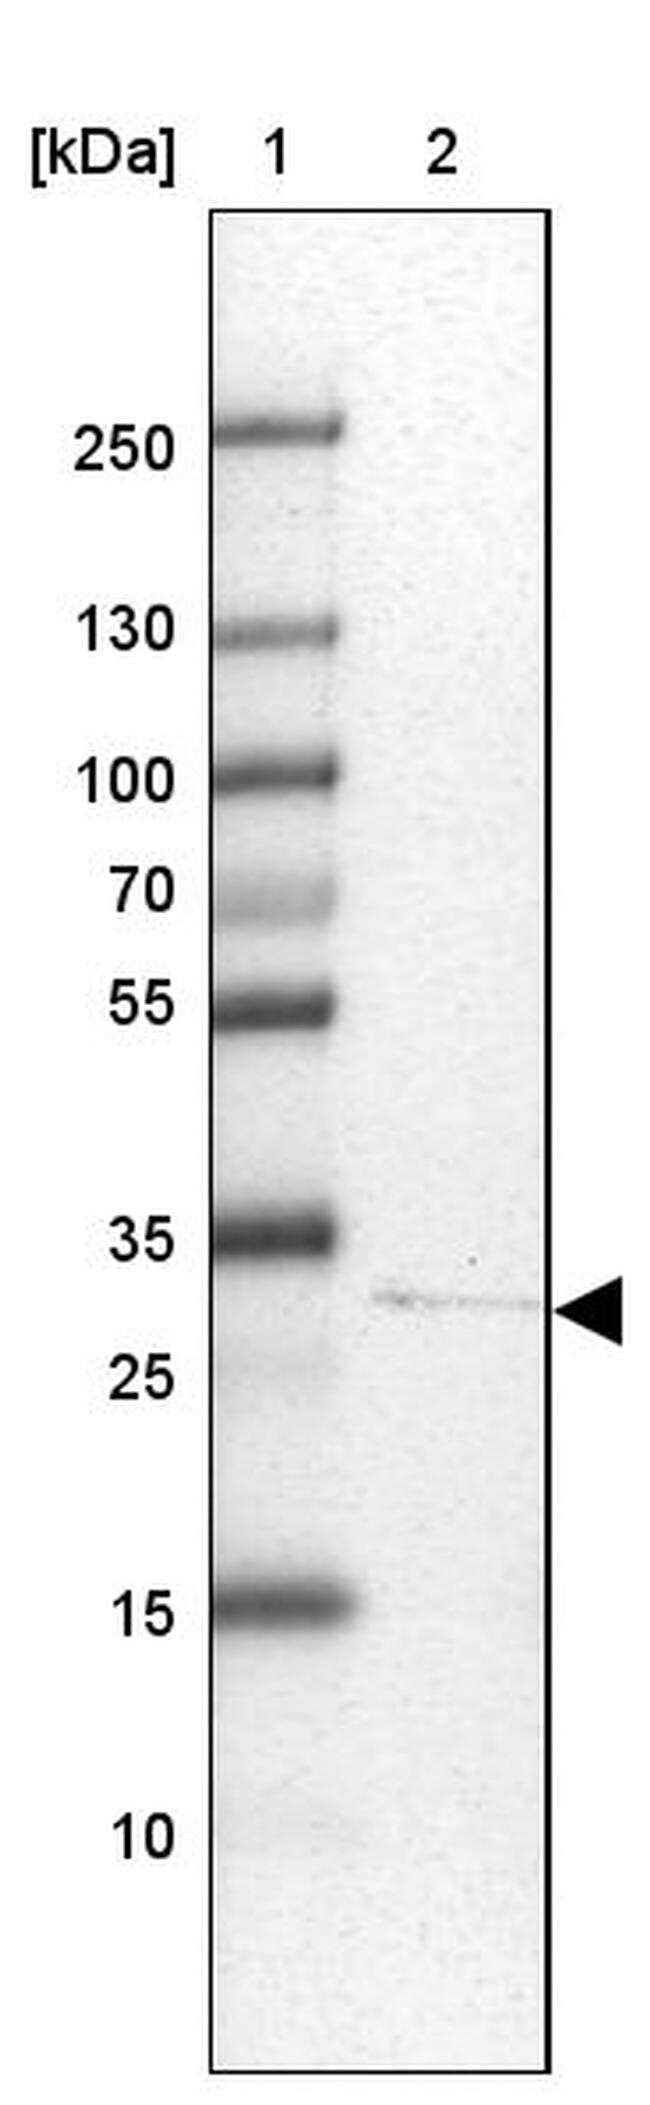 HSD17B11 Antibody in Western Blot (WB)